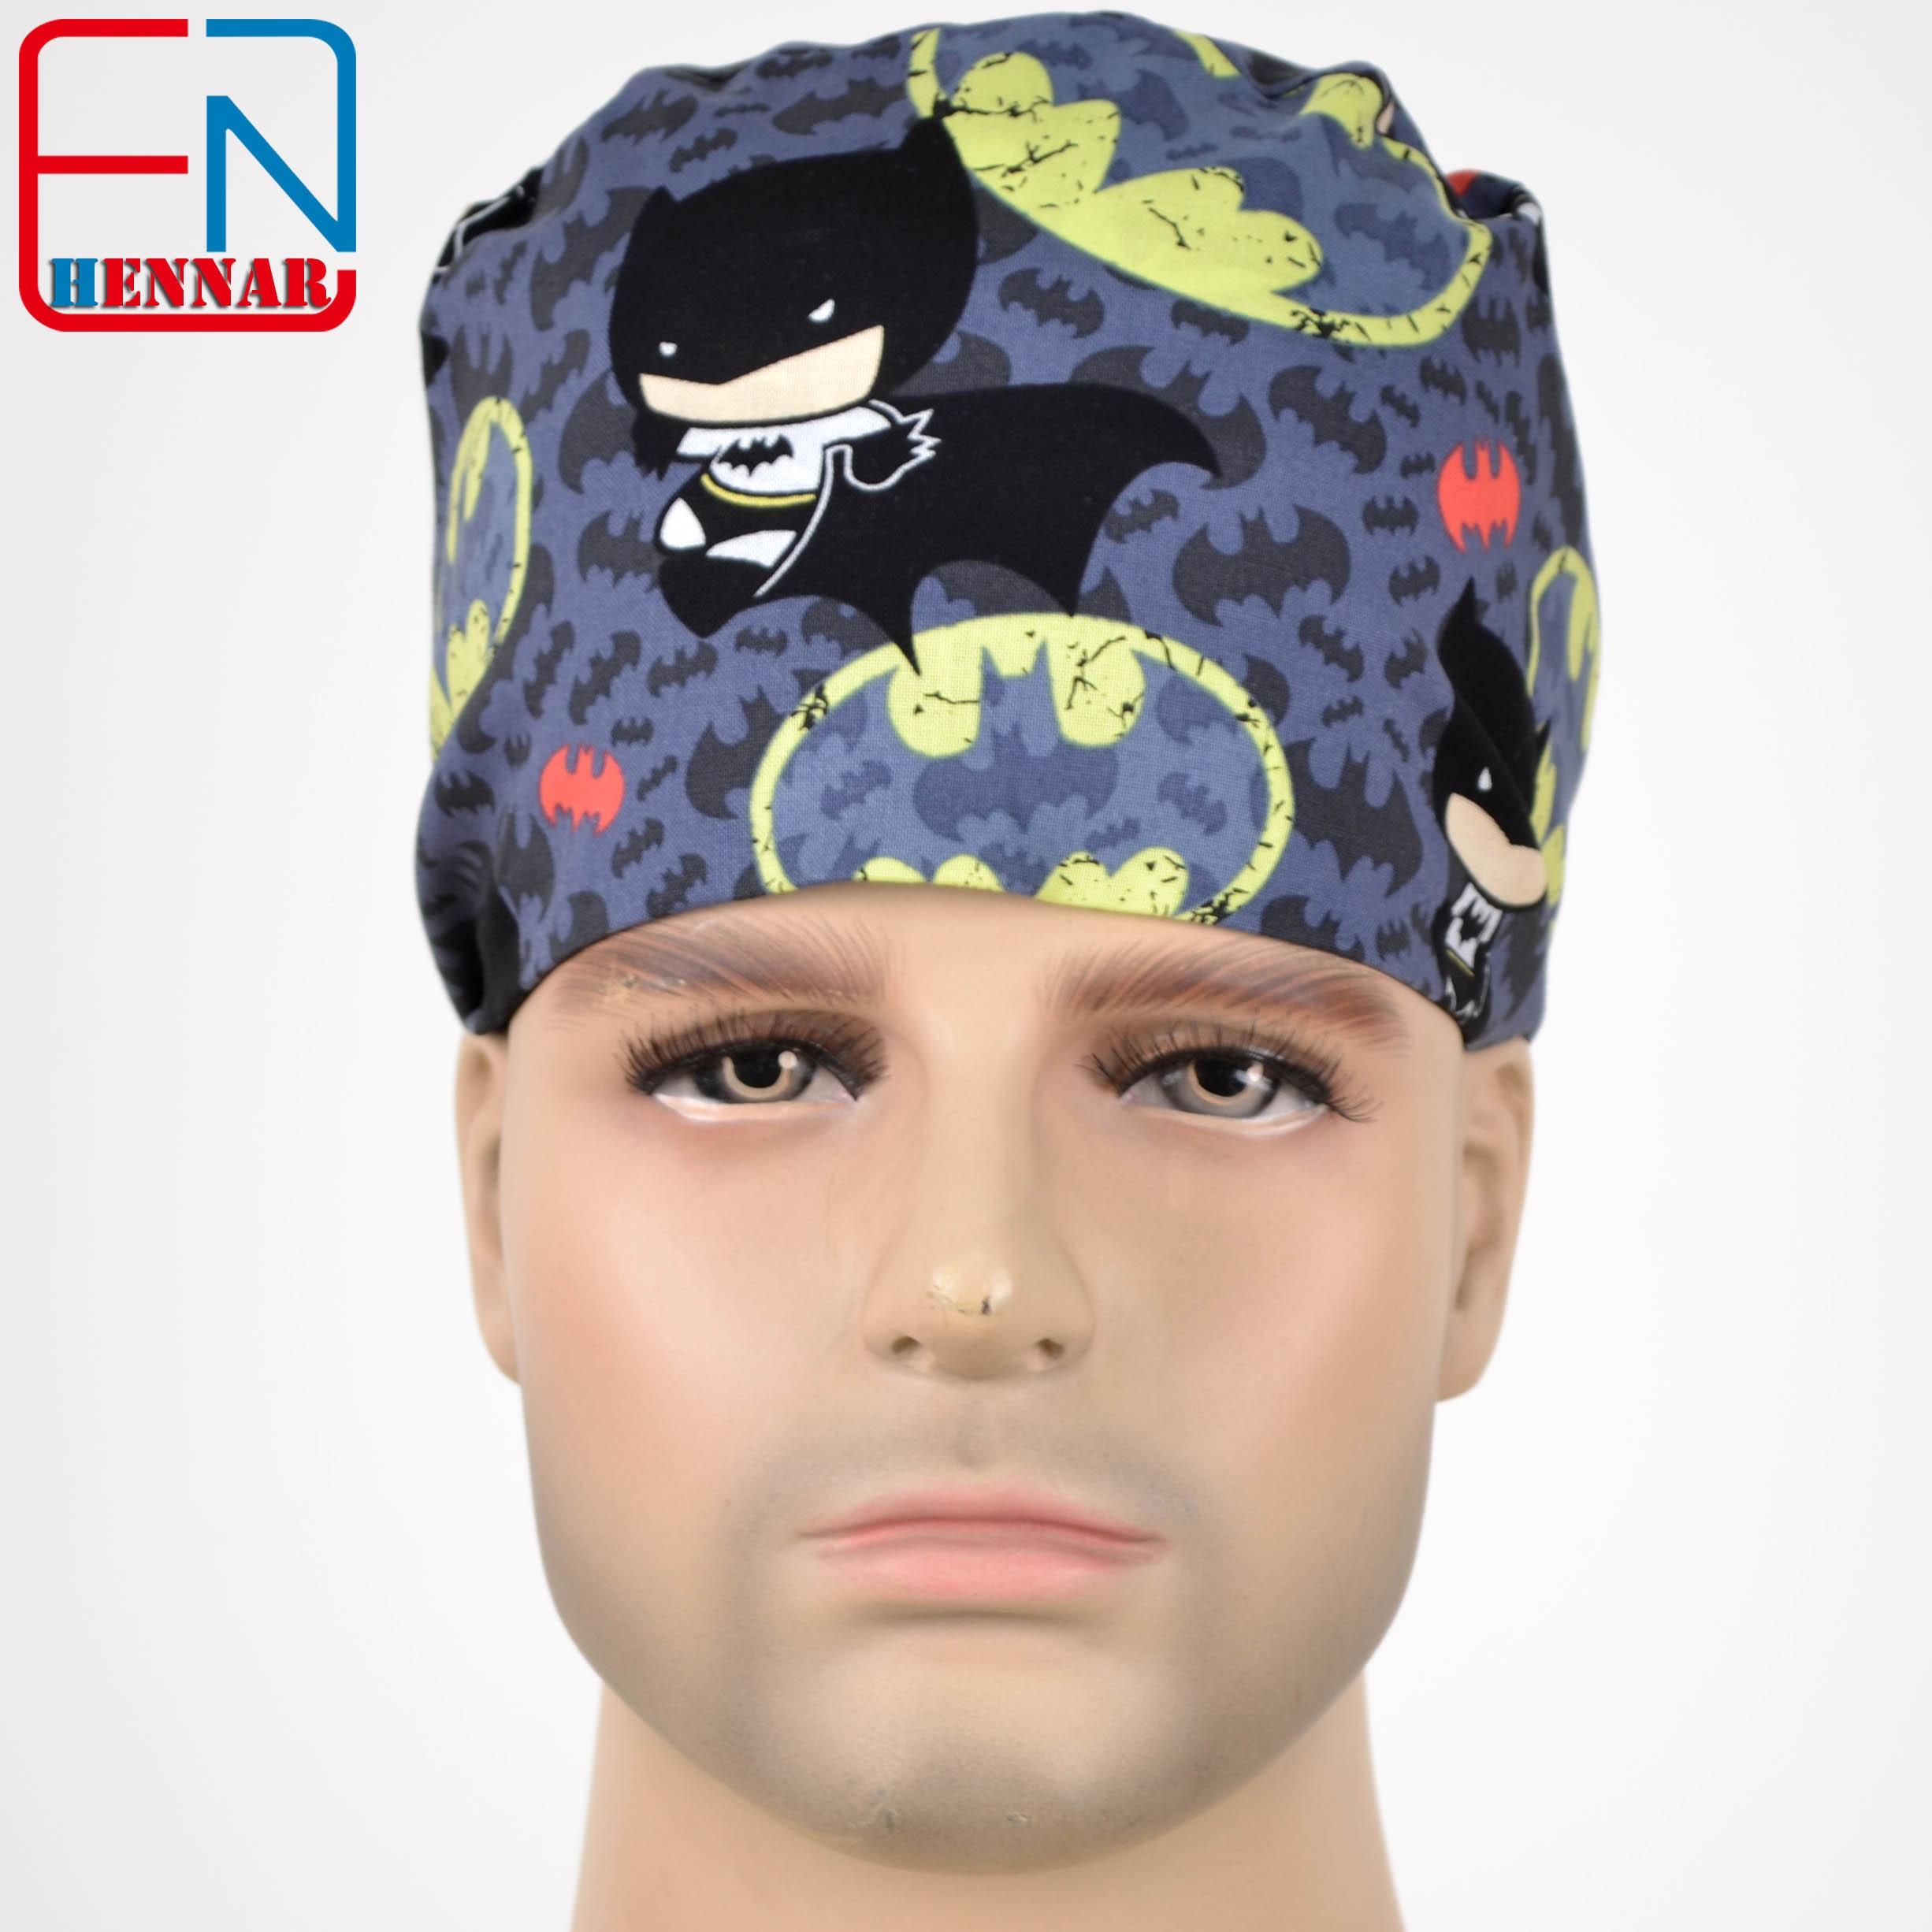 Hennar Men's Scrub Caps 100% Cotton Adjustable Elastic Bands Surgical Scrub Caps Medical Hospital Doctor Headwear Cap